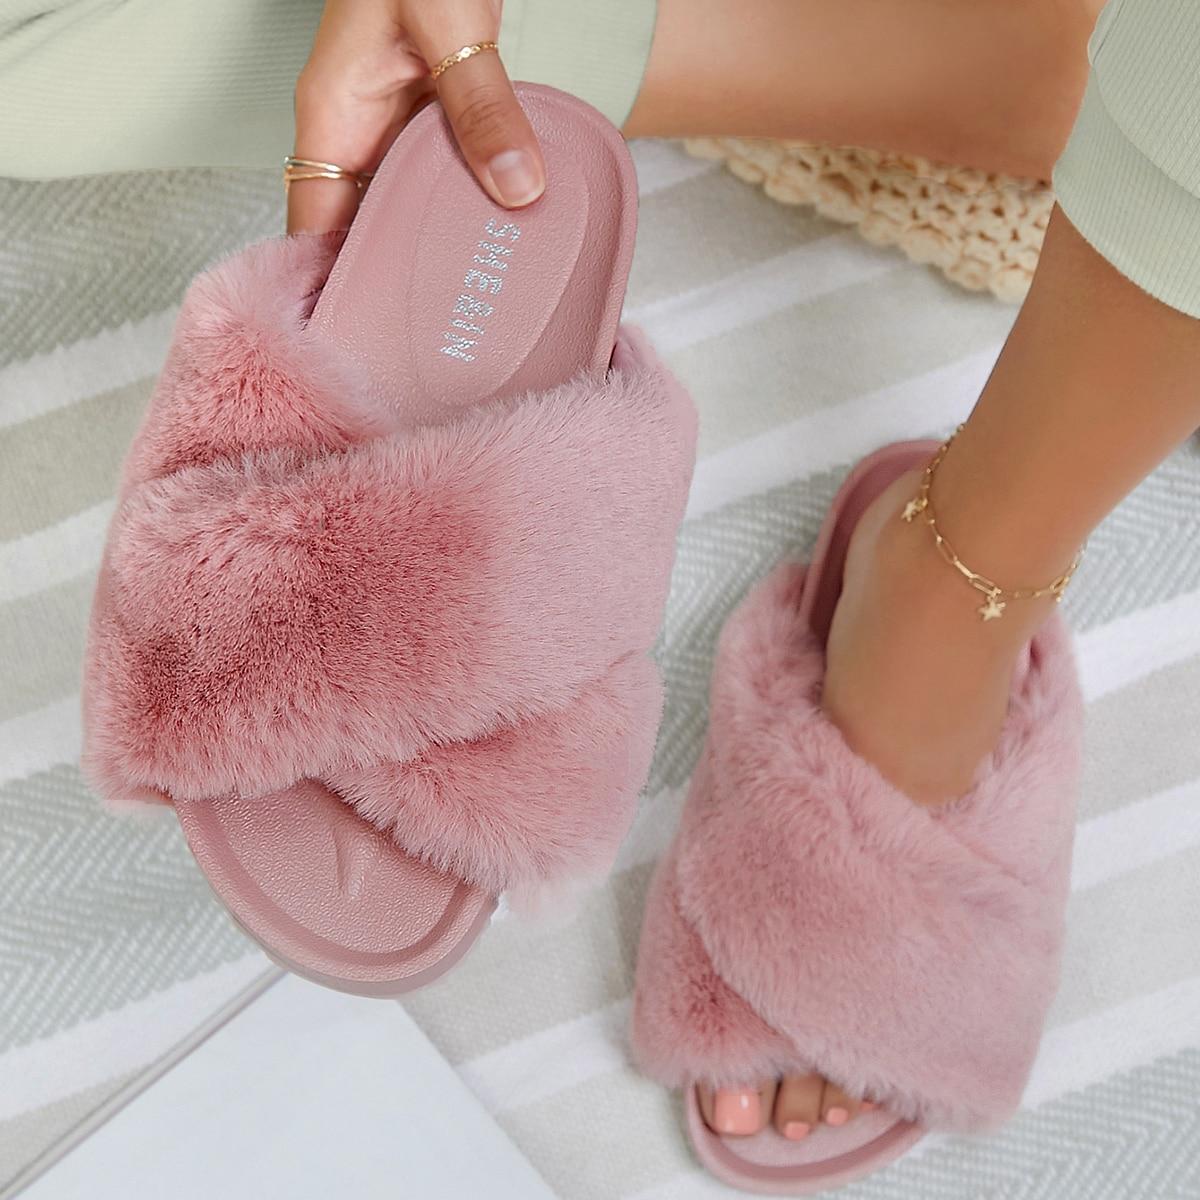 SHEIN / Faux Fur Crisscross Vamp Slide Sandals